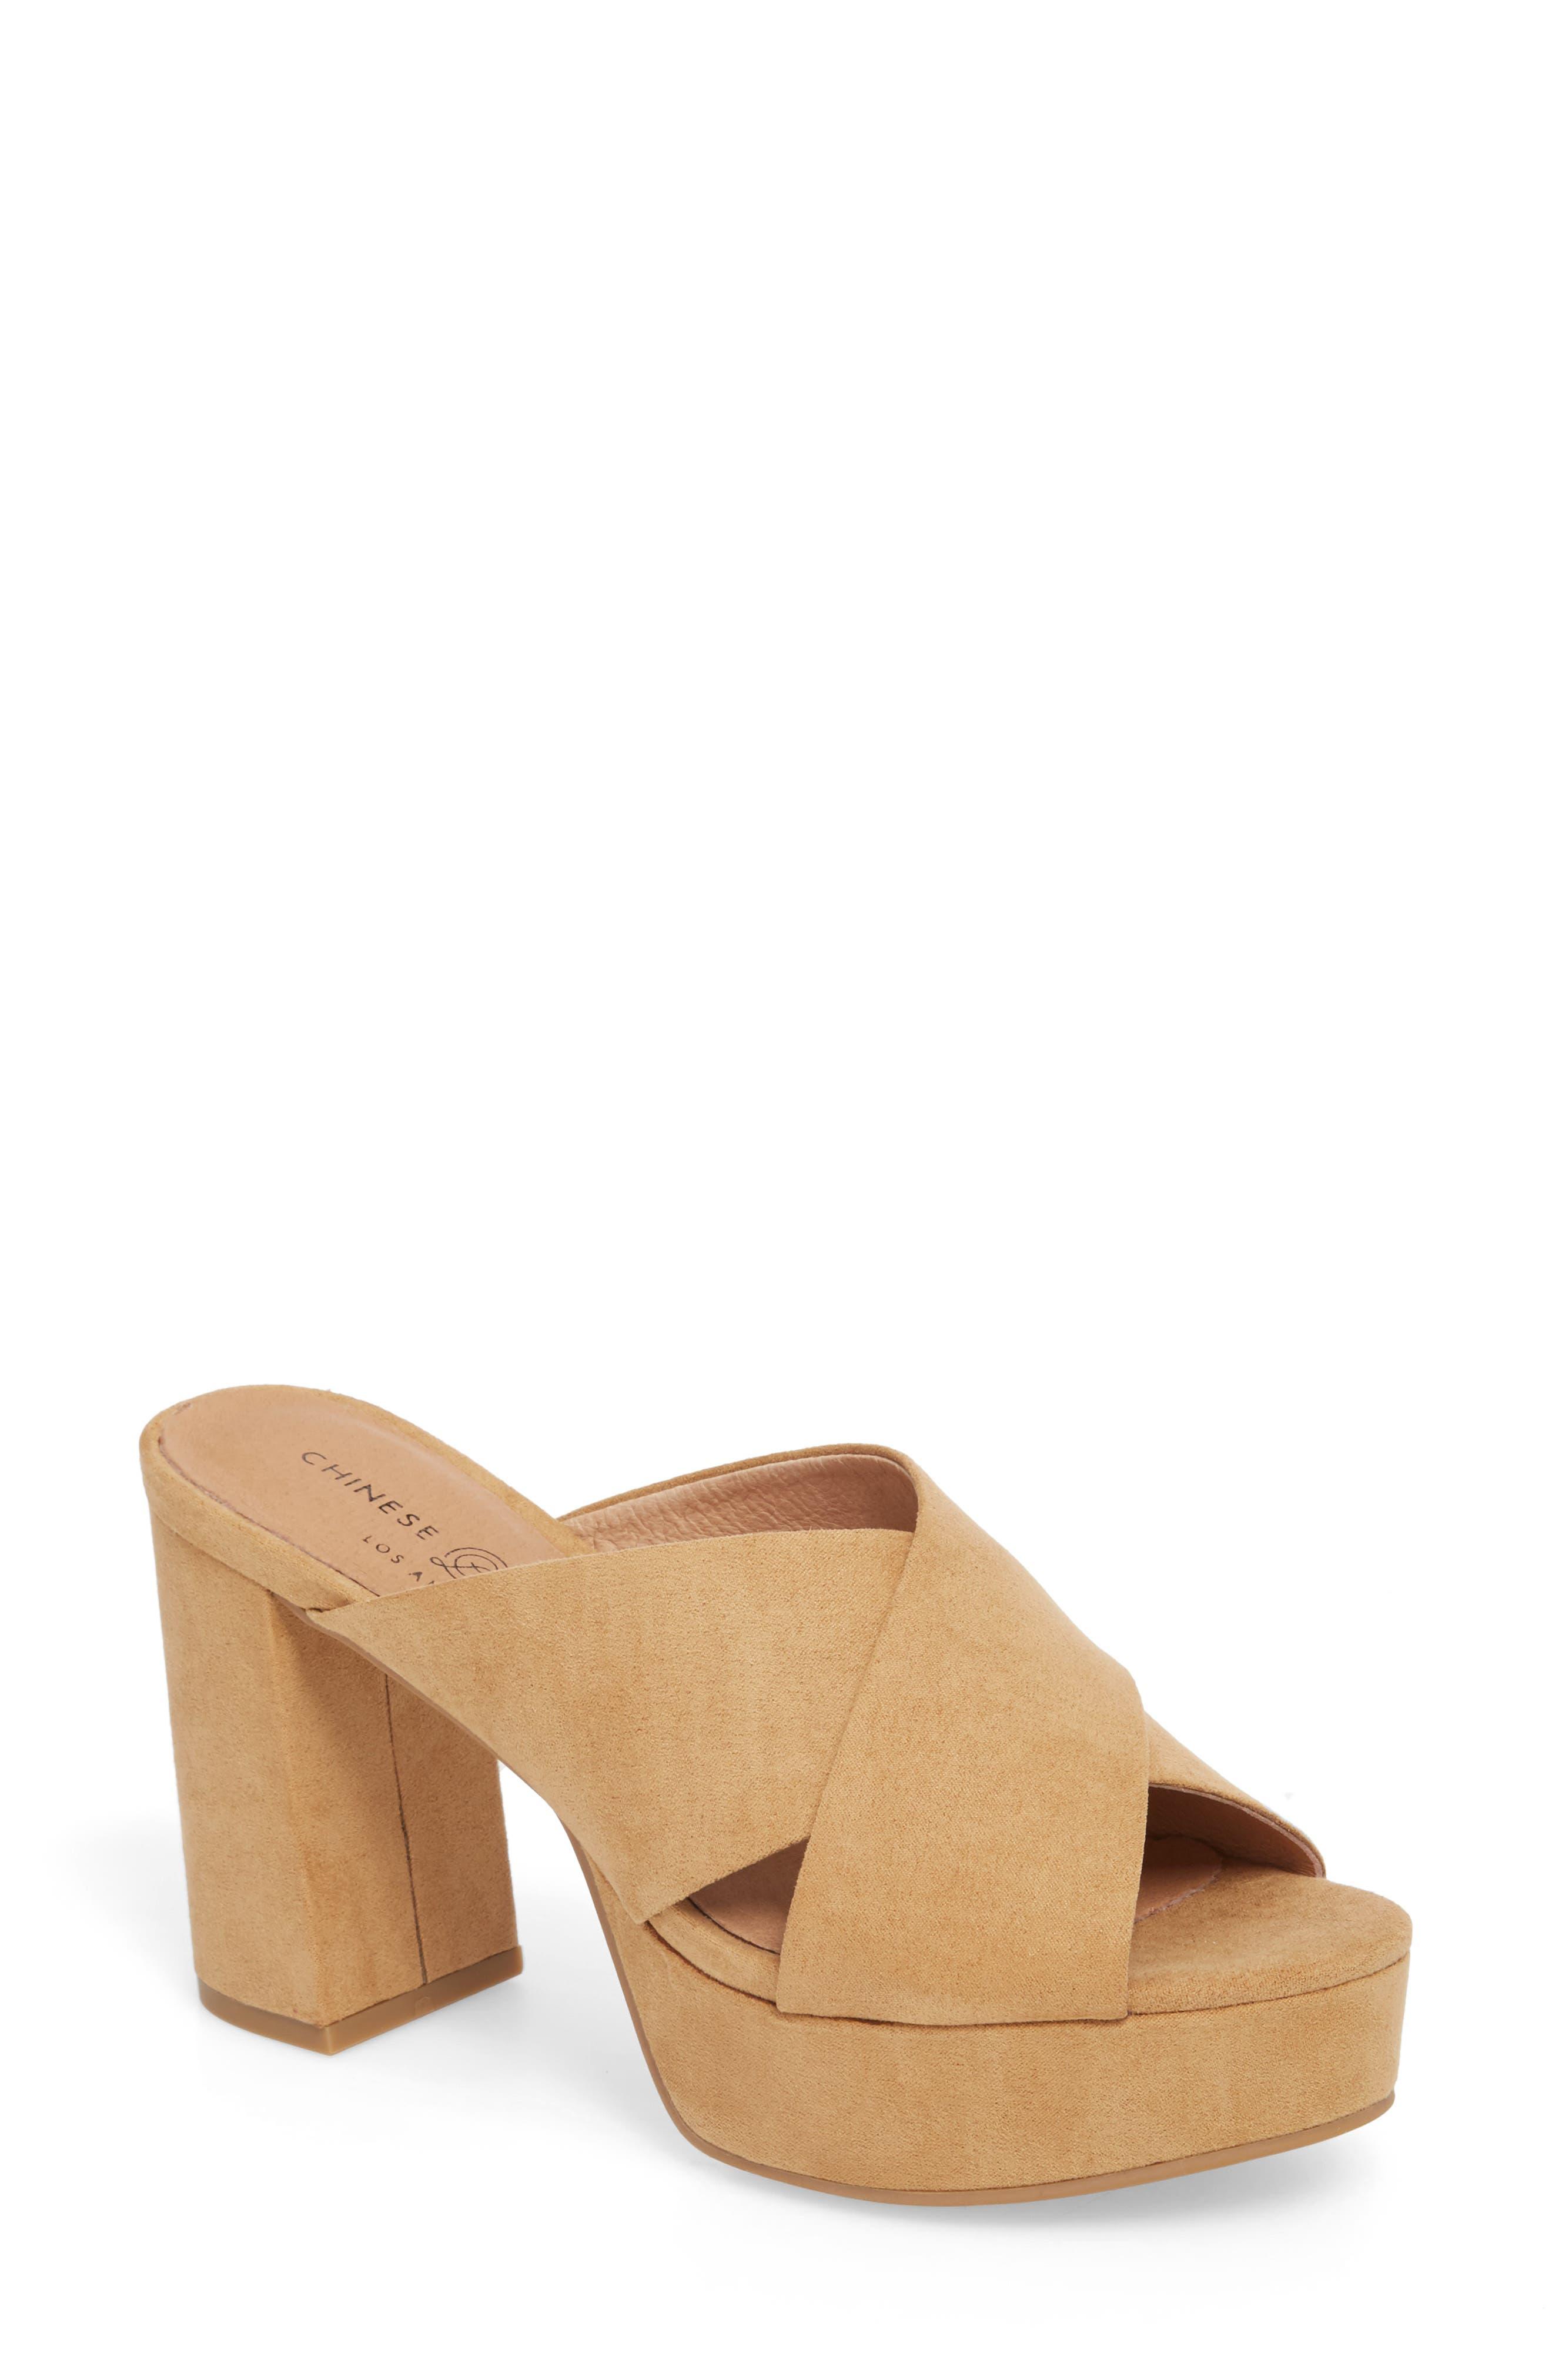 Chinese Laundry Teagan Cross Strap Platform Sandal (Women)